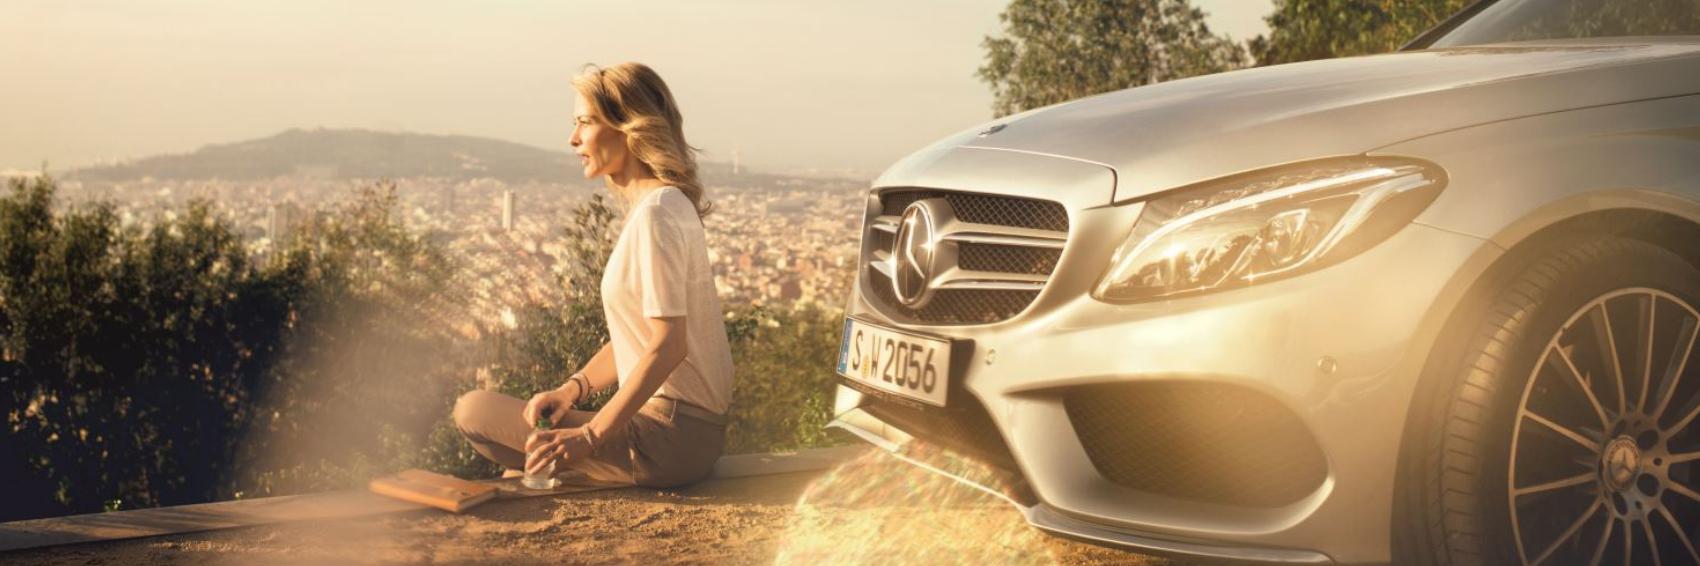 Mercedes Klimaanlage desinfizieren